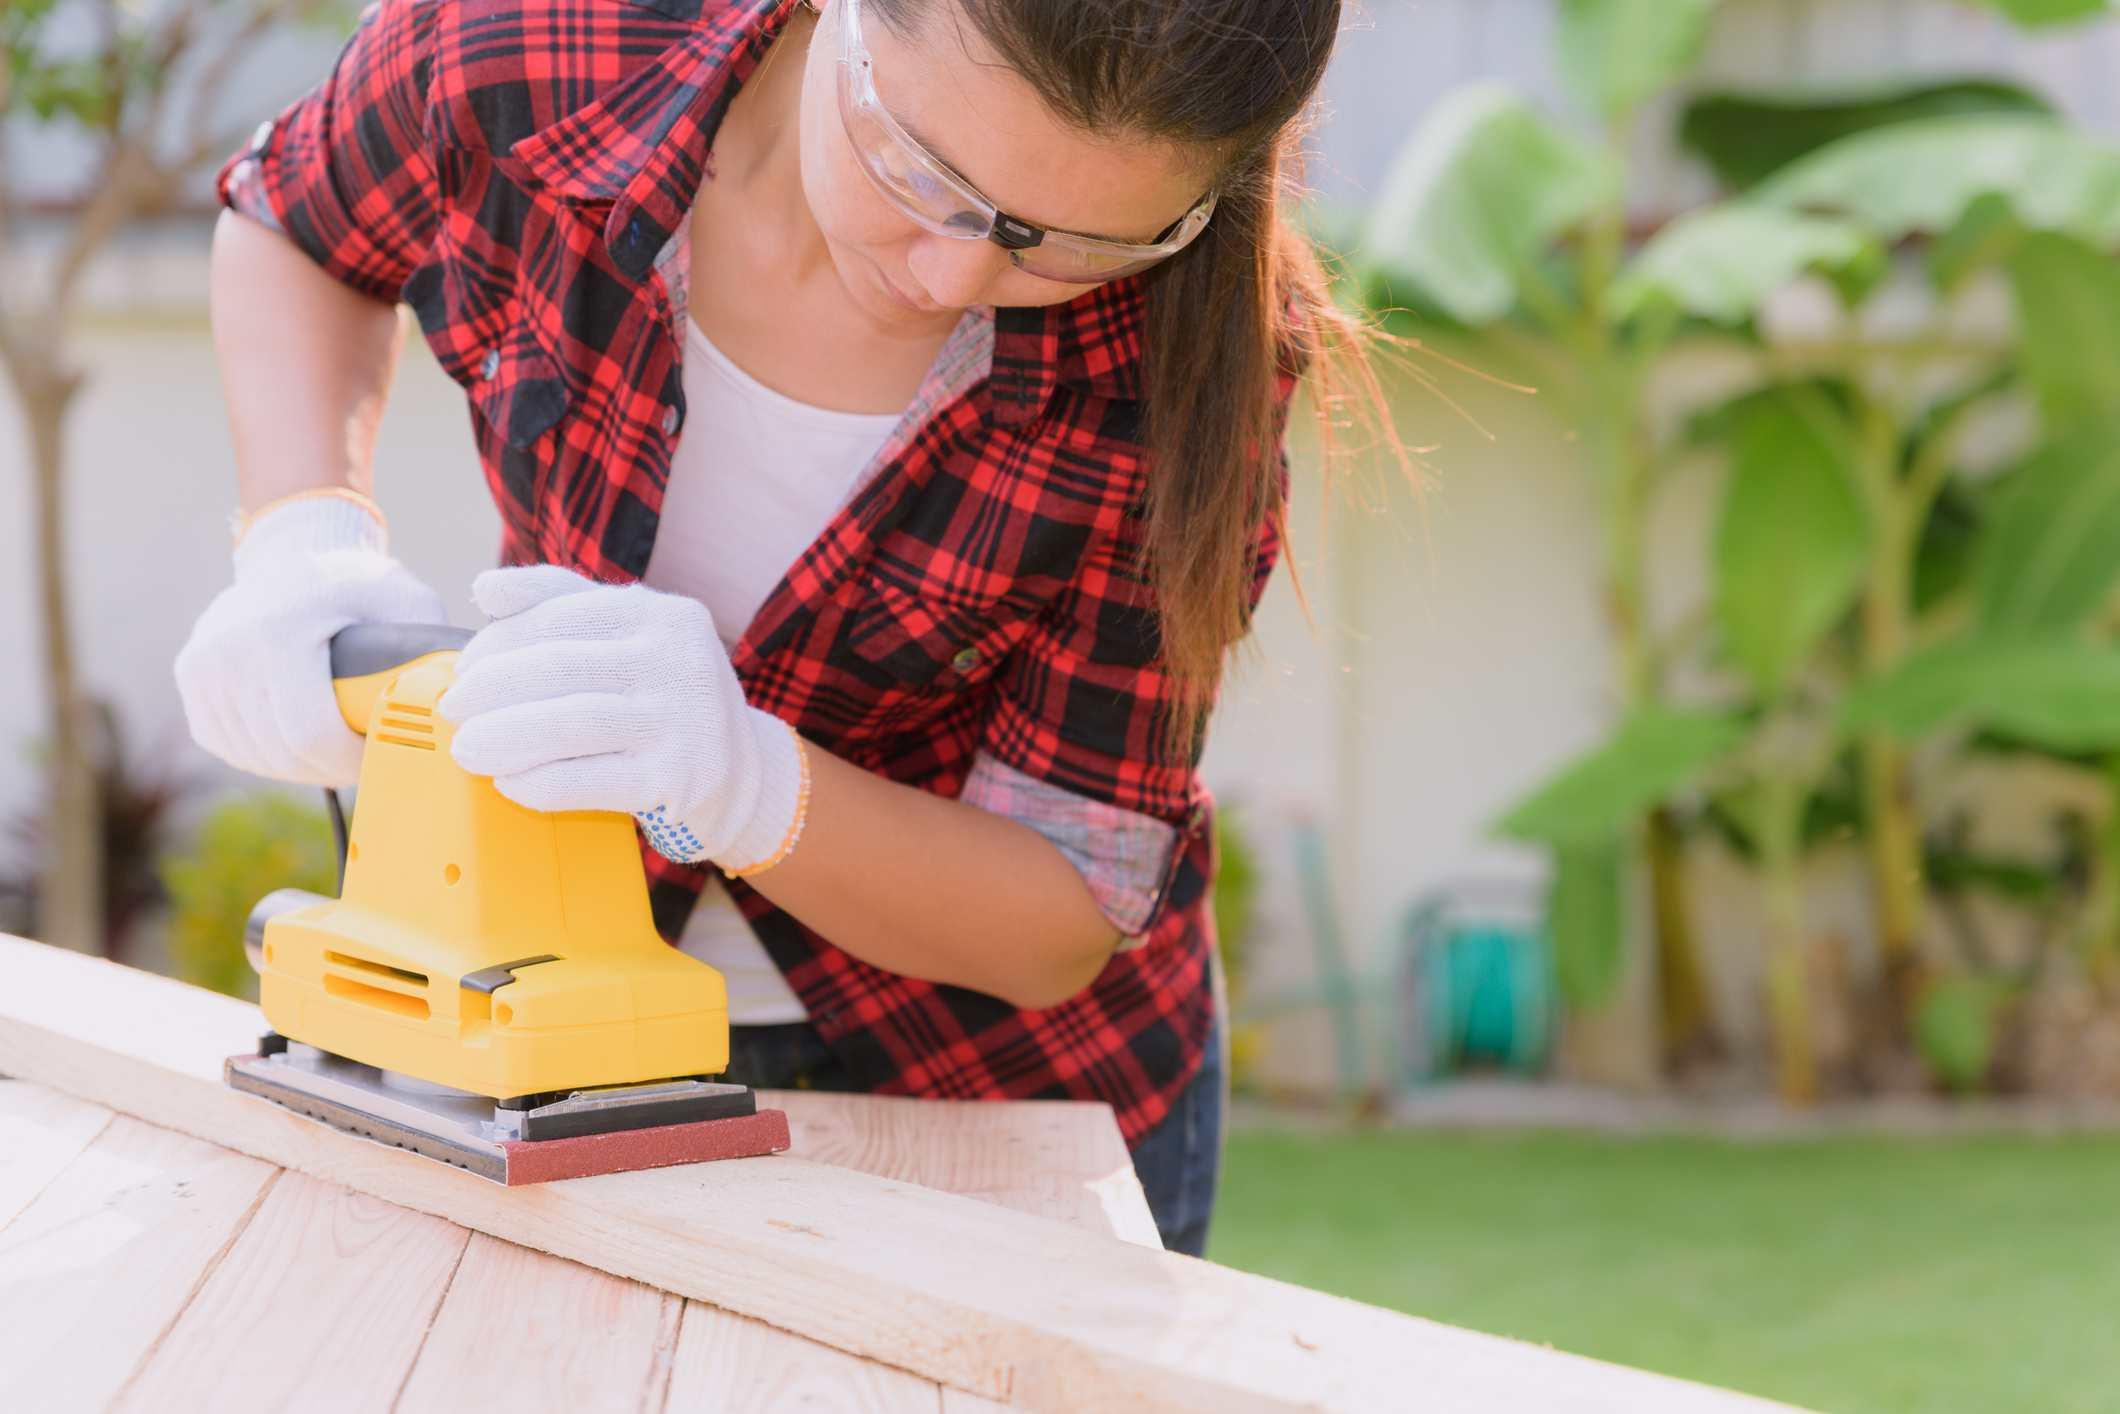 A woman hand sanding a piece of wood